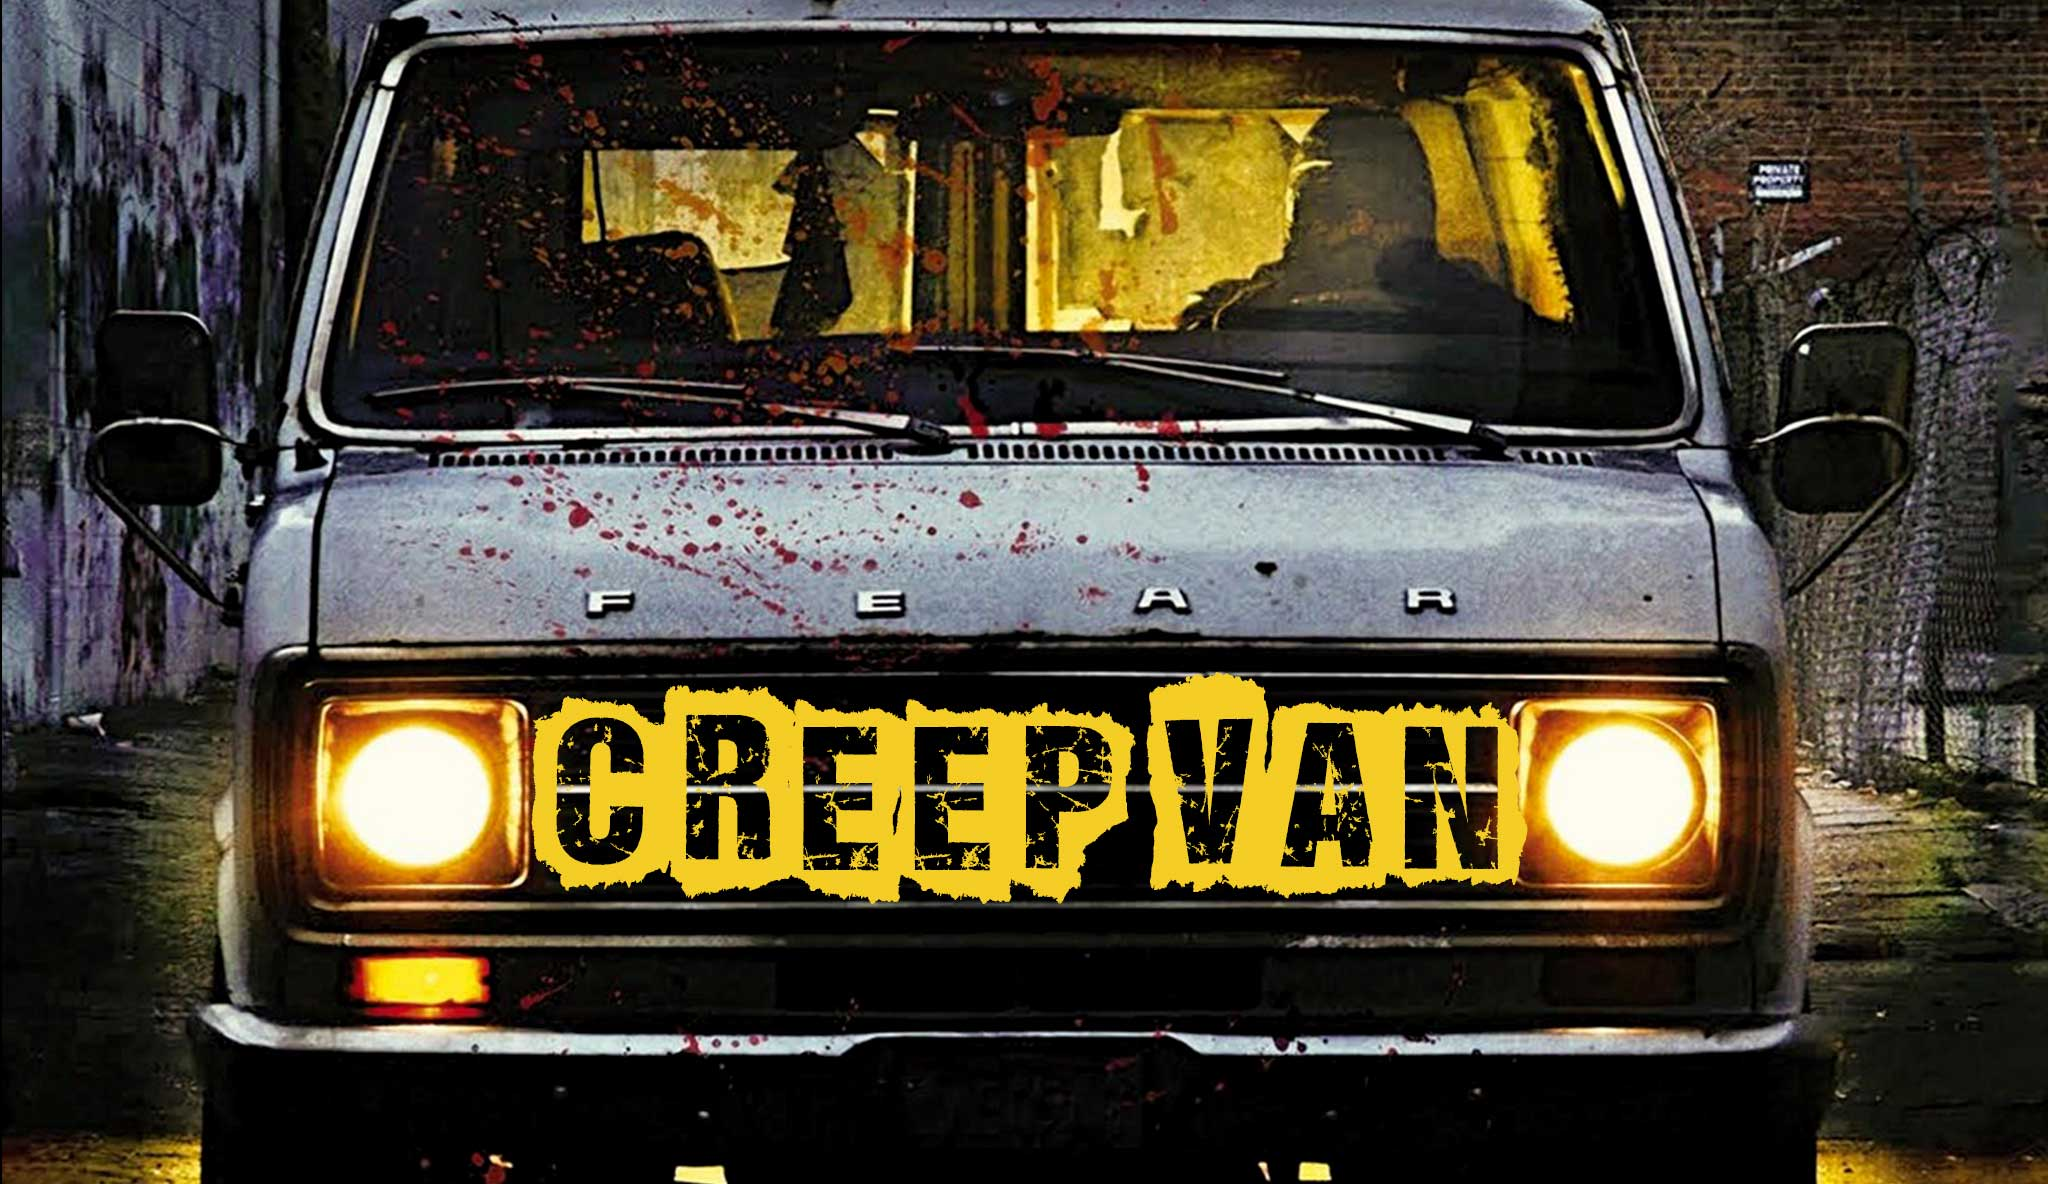 creep-van-terror-auf-vier-radern\header.jpg